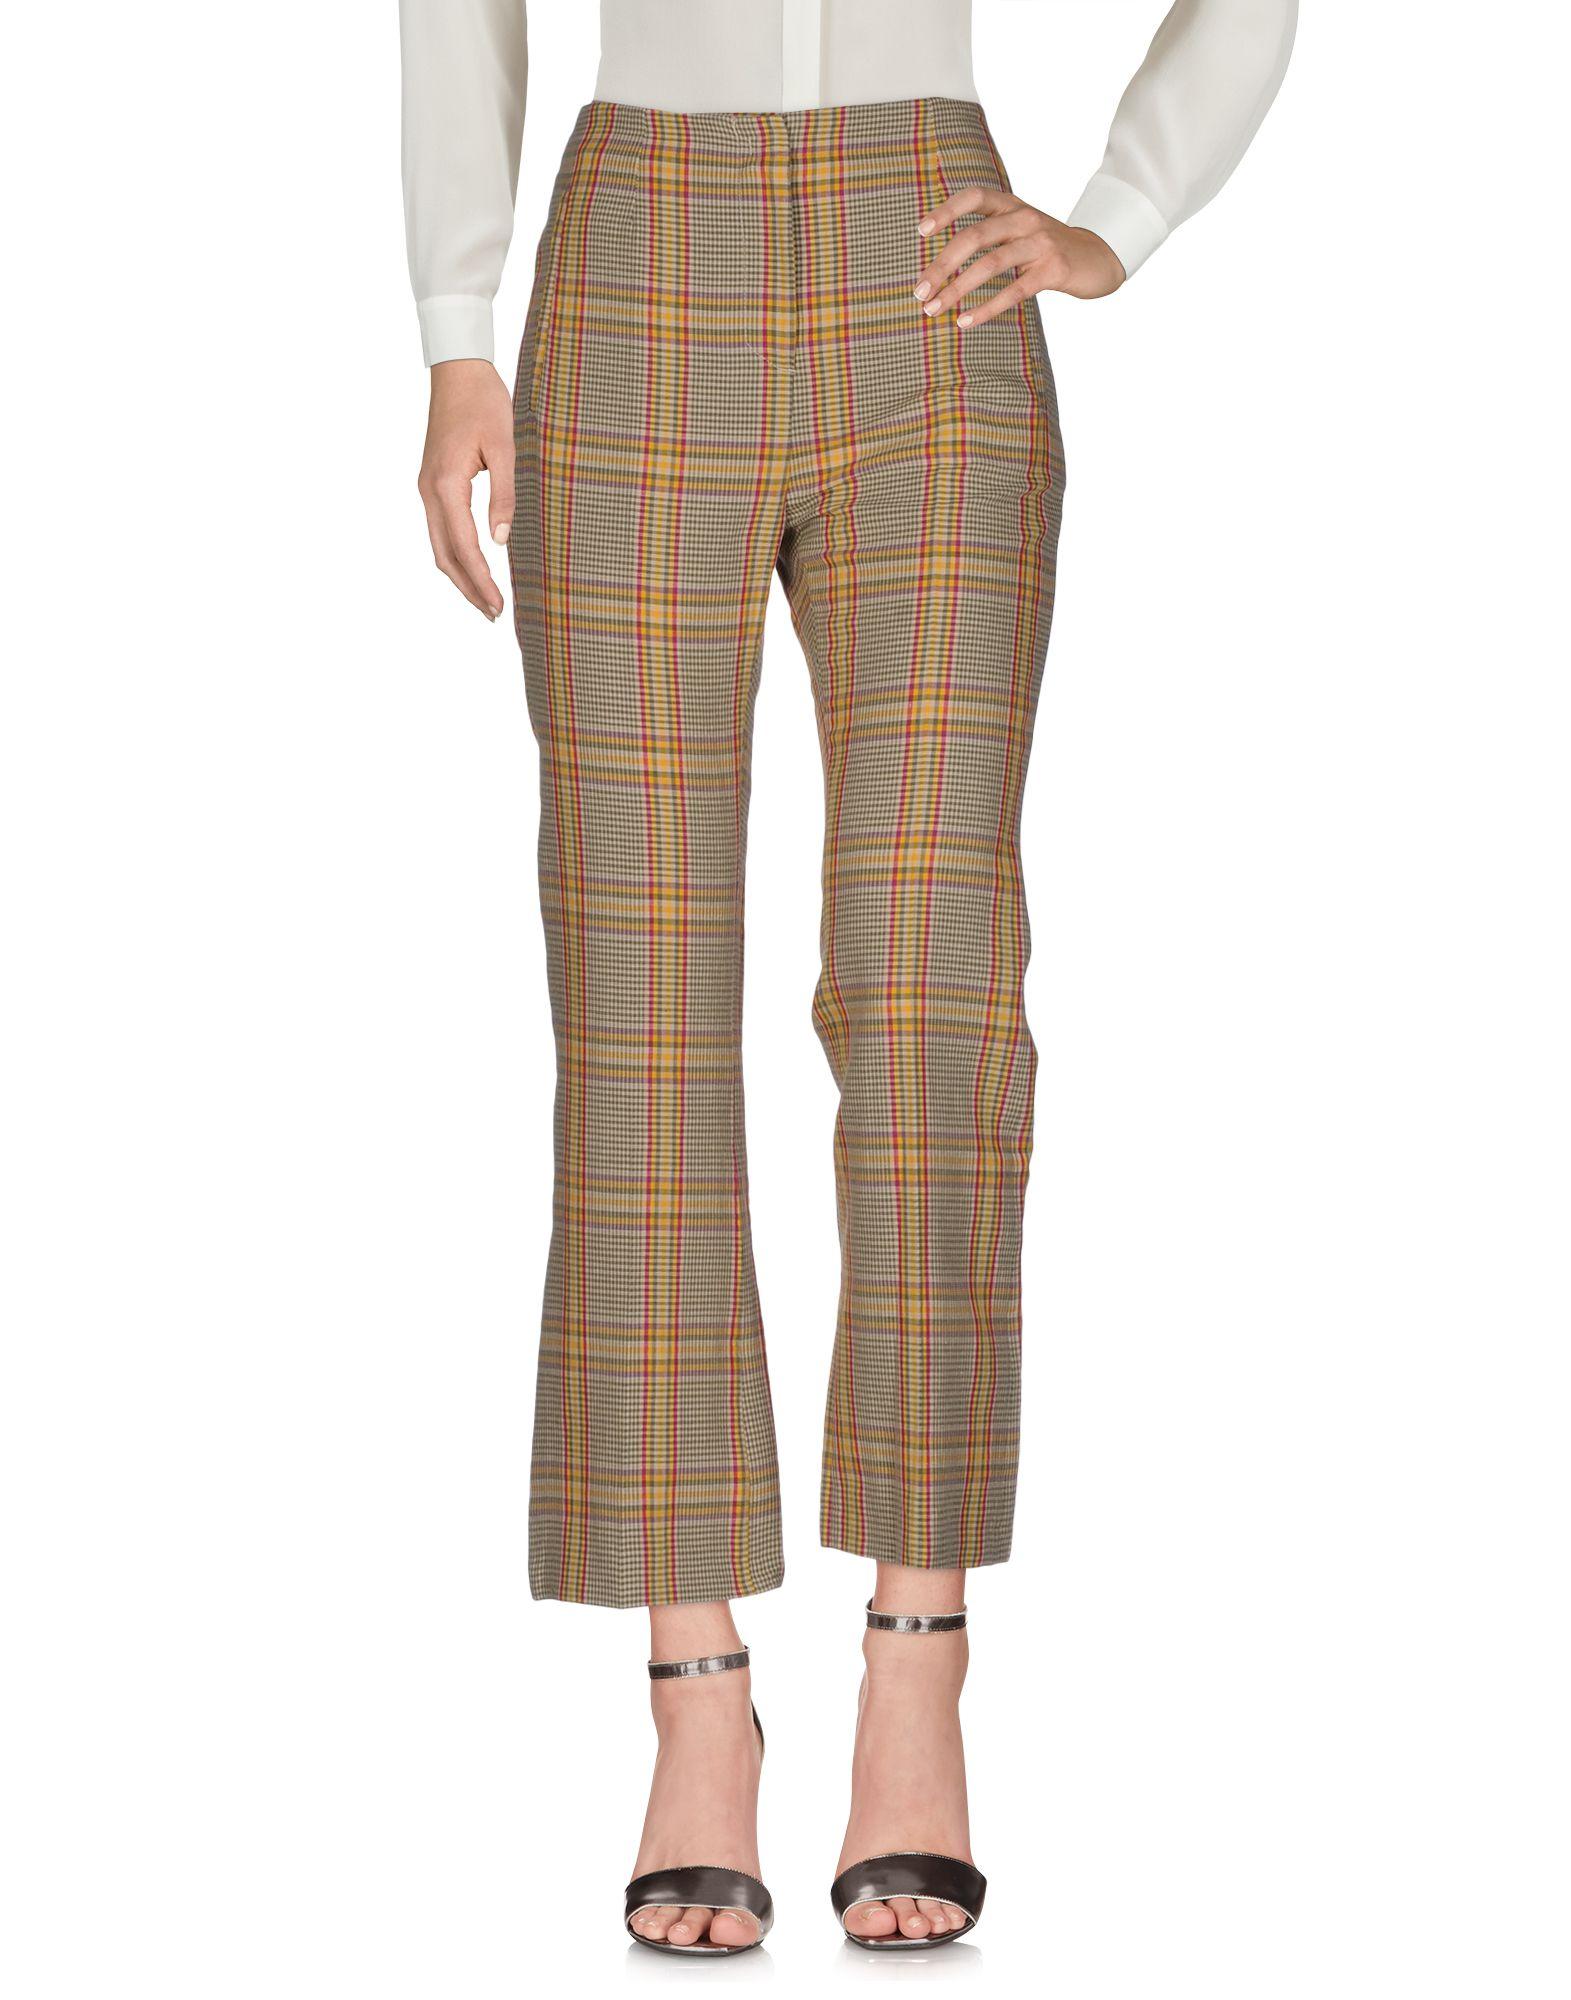 Pantalone Jucca Donna - Acquista online su 6b3Jl